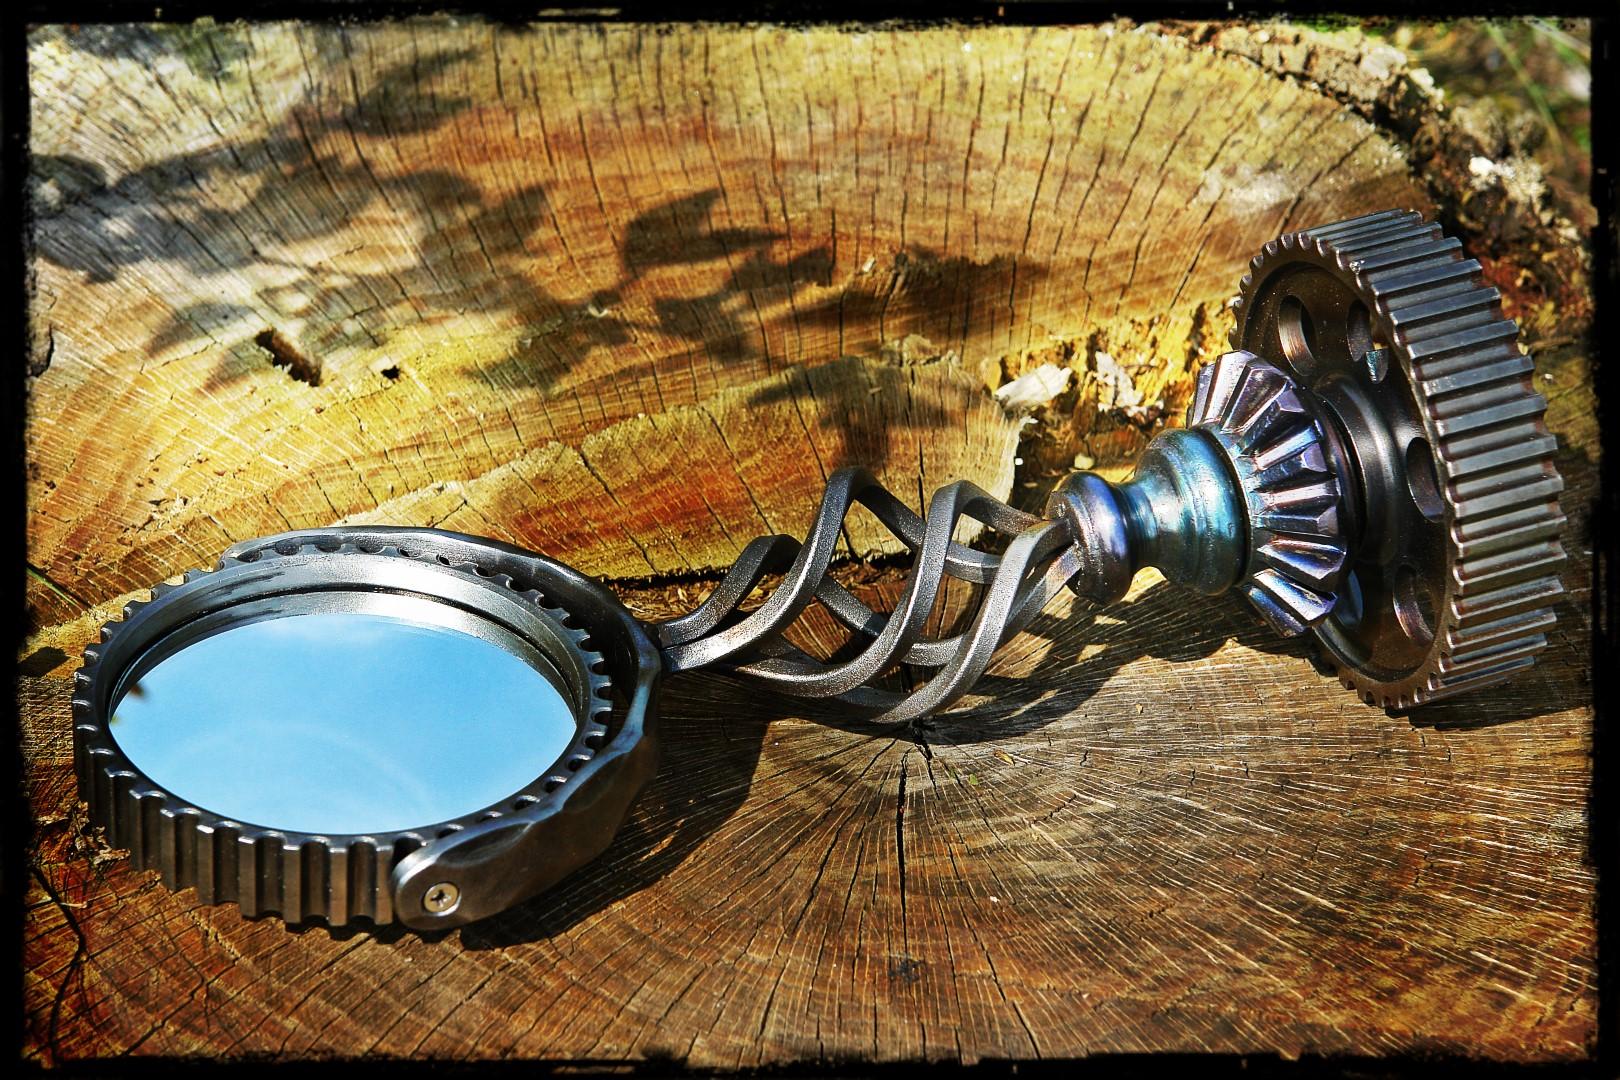 Blacksmith Upcycles Car Parts into a Beautiful Mirror